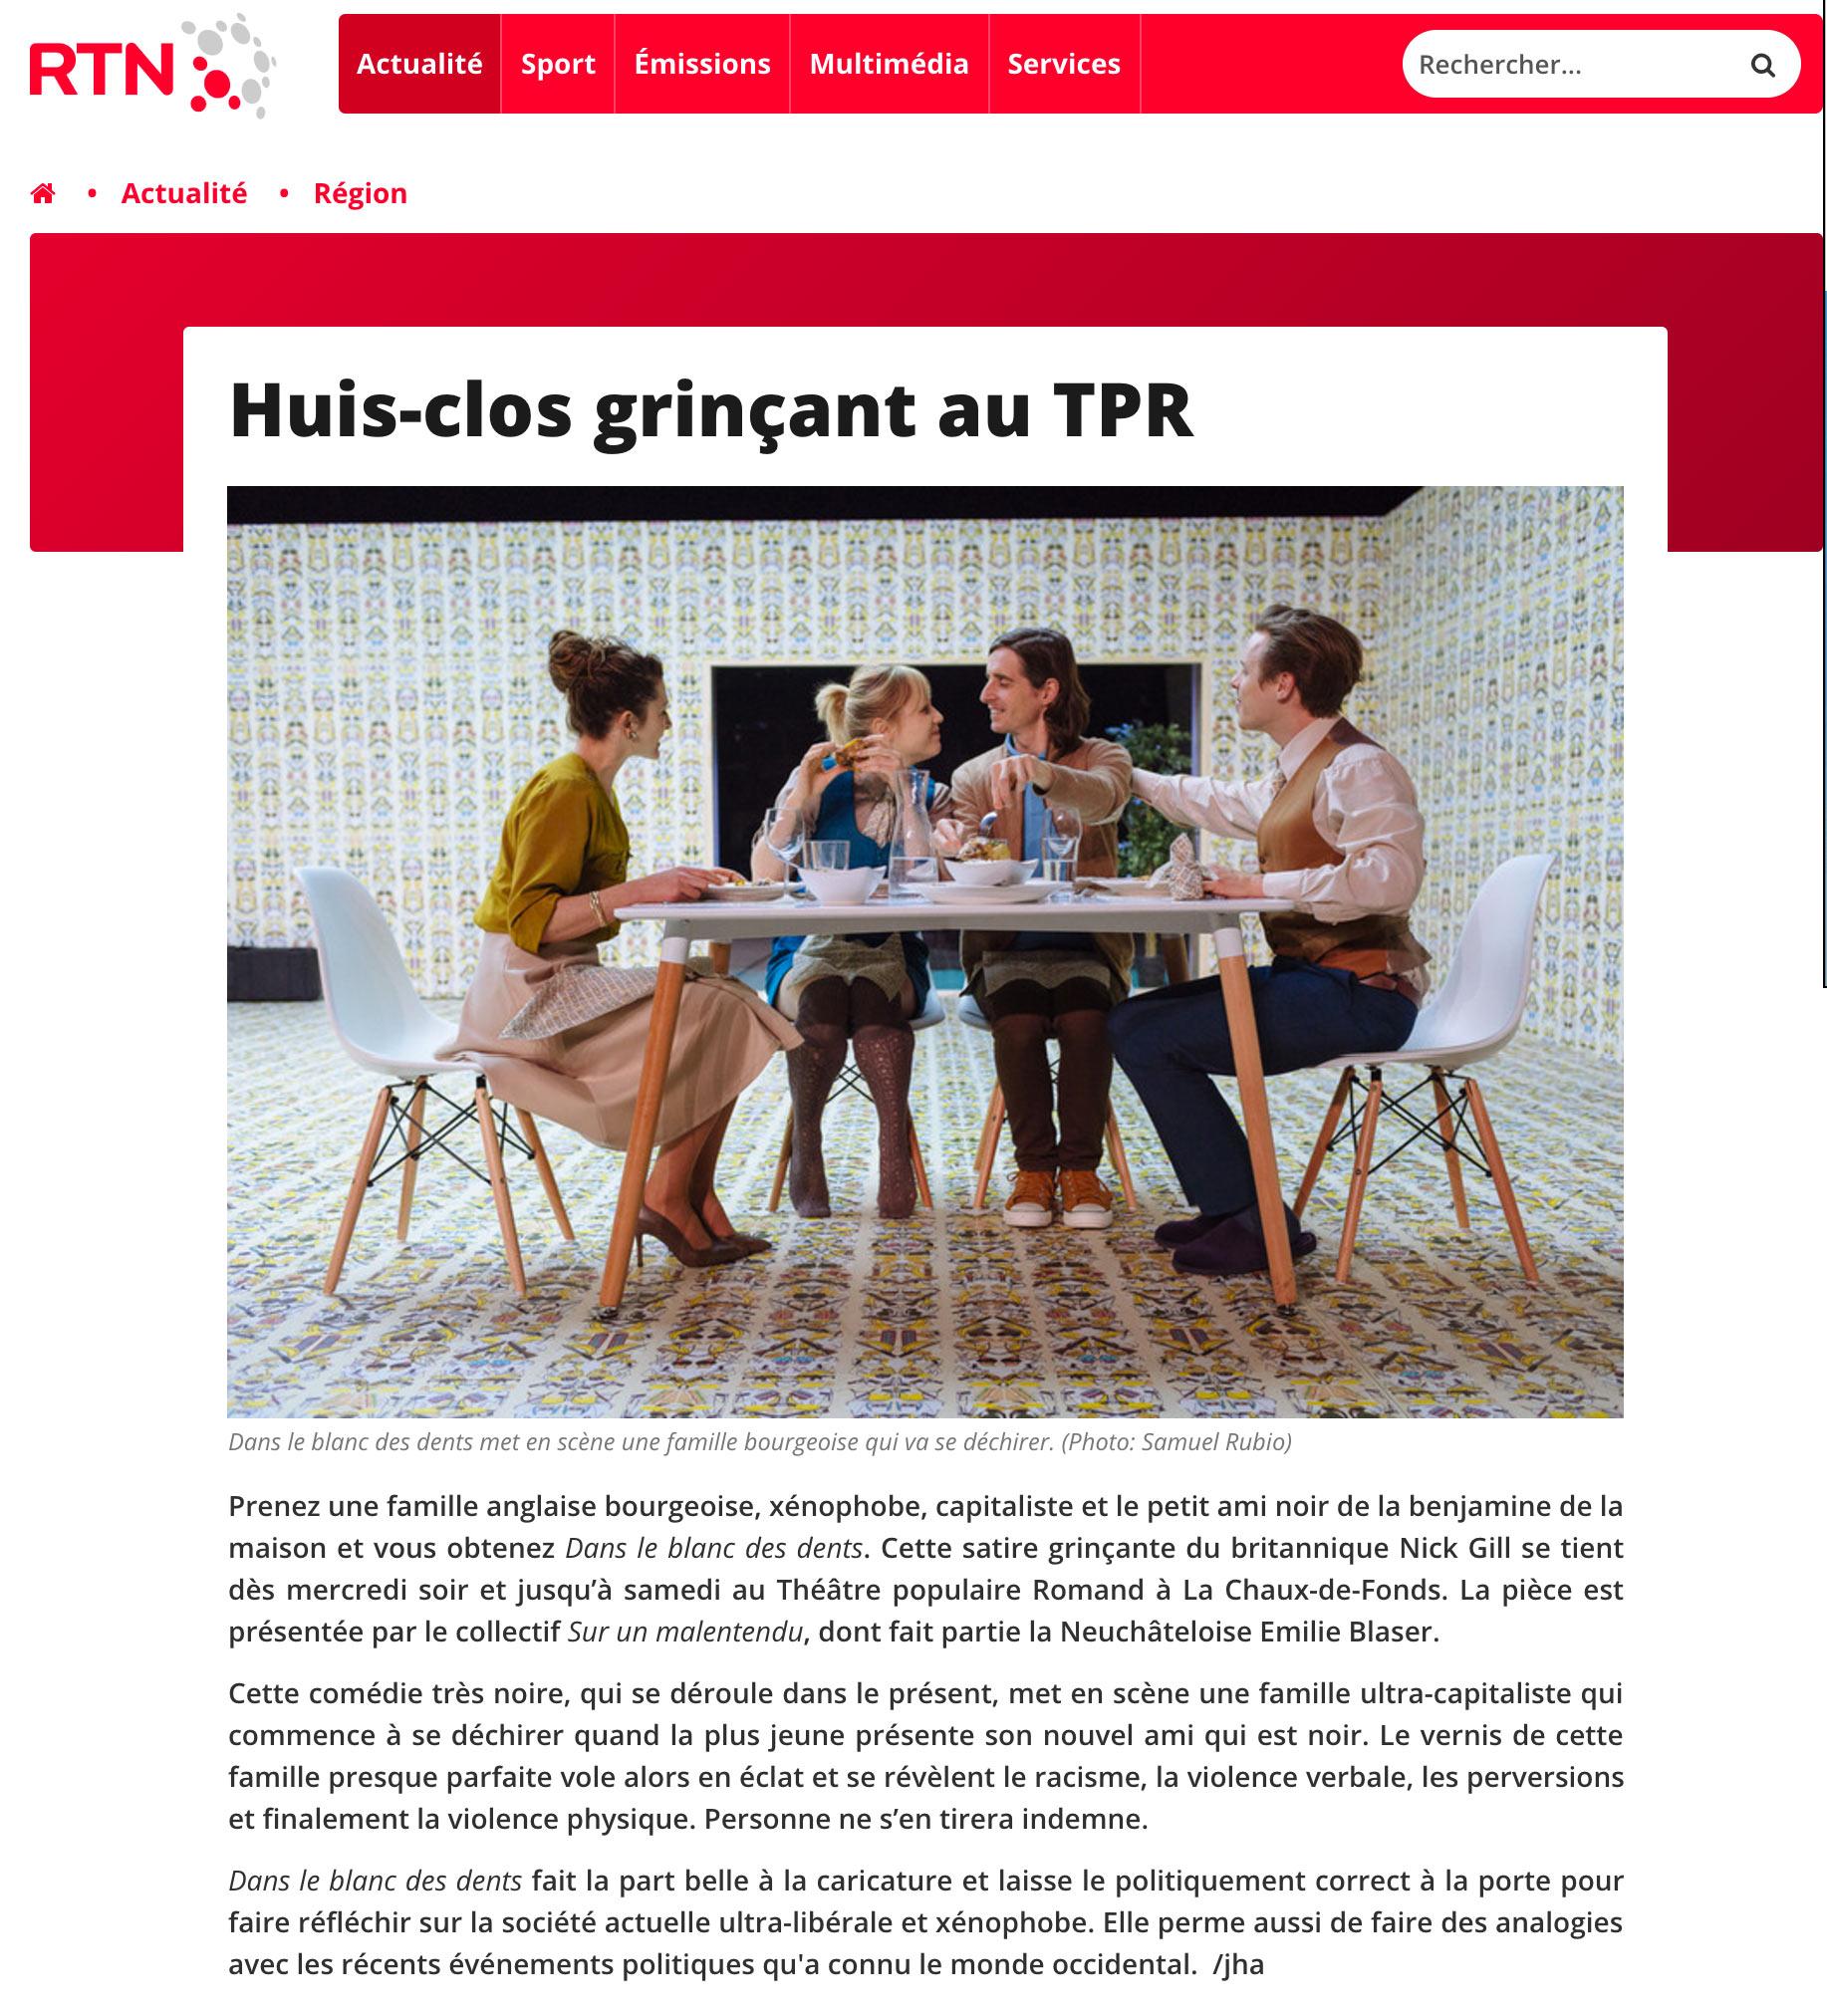 rtn-article-dansleblancdesdents